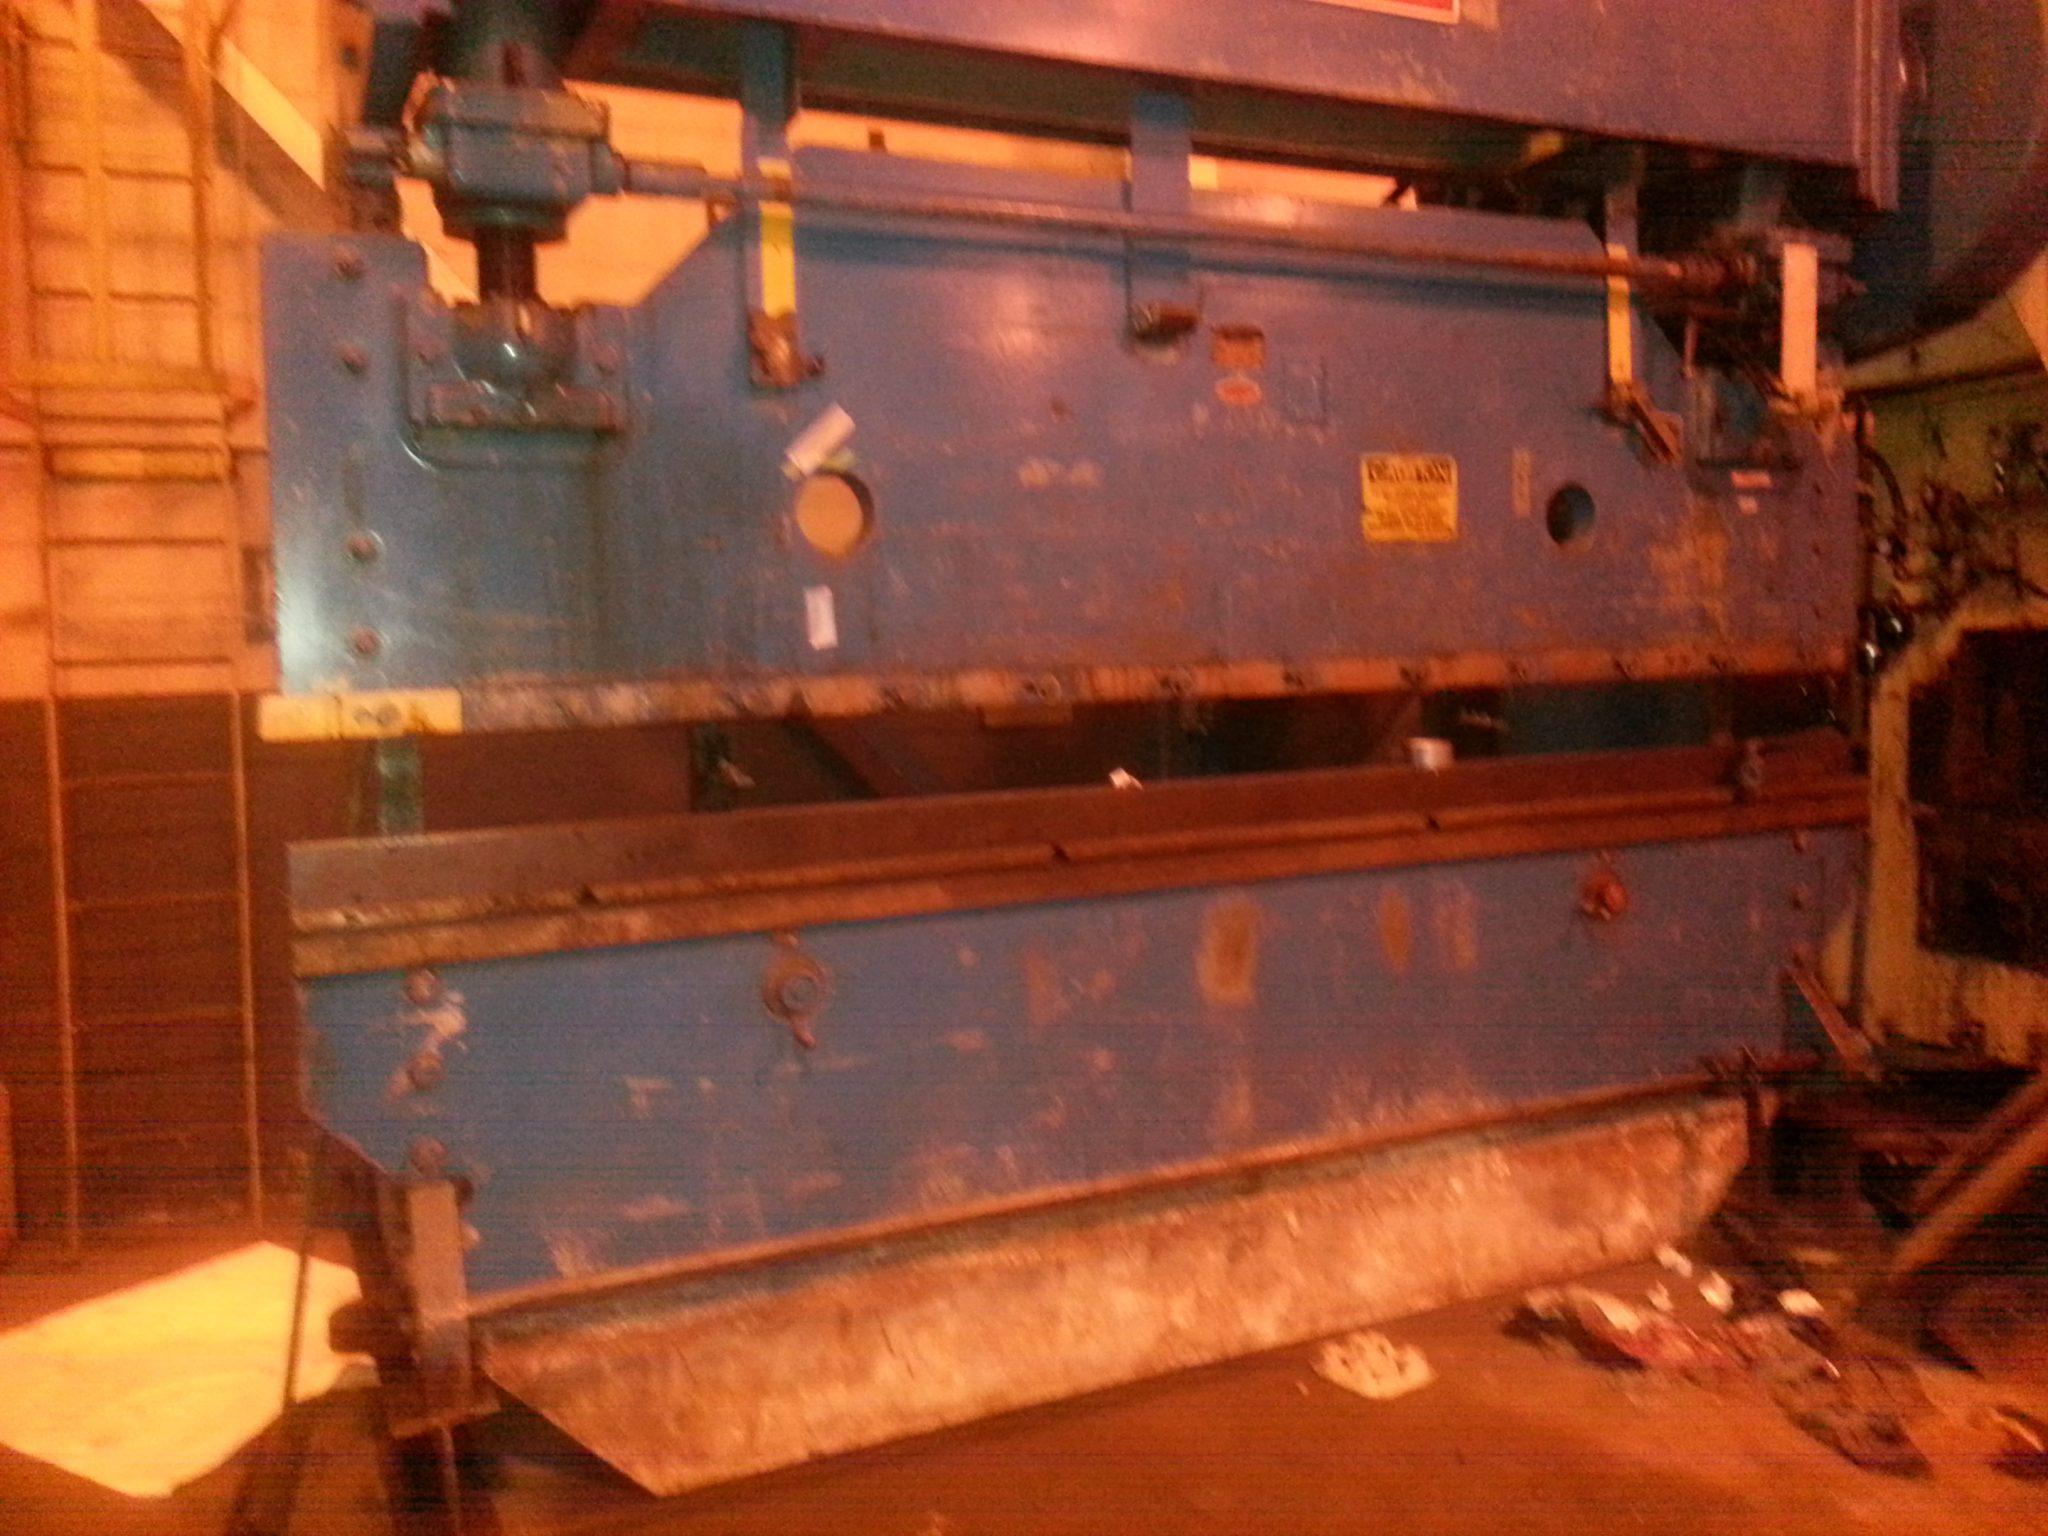 Lodge and Shipley Press Brake 4